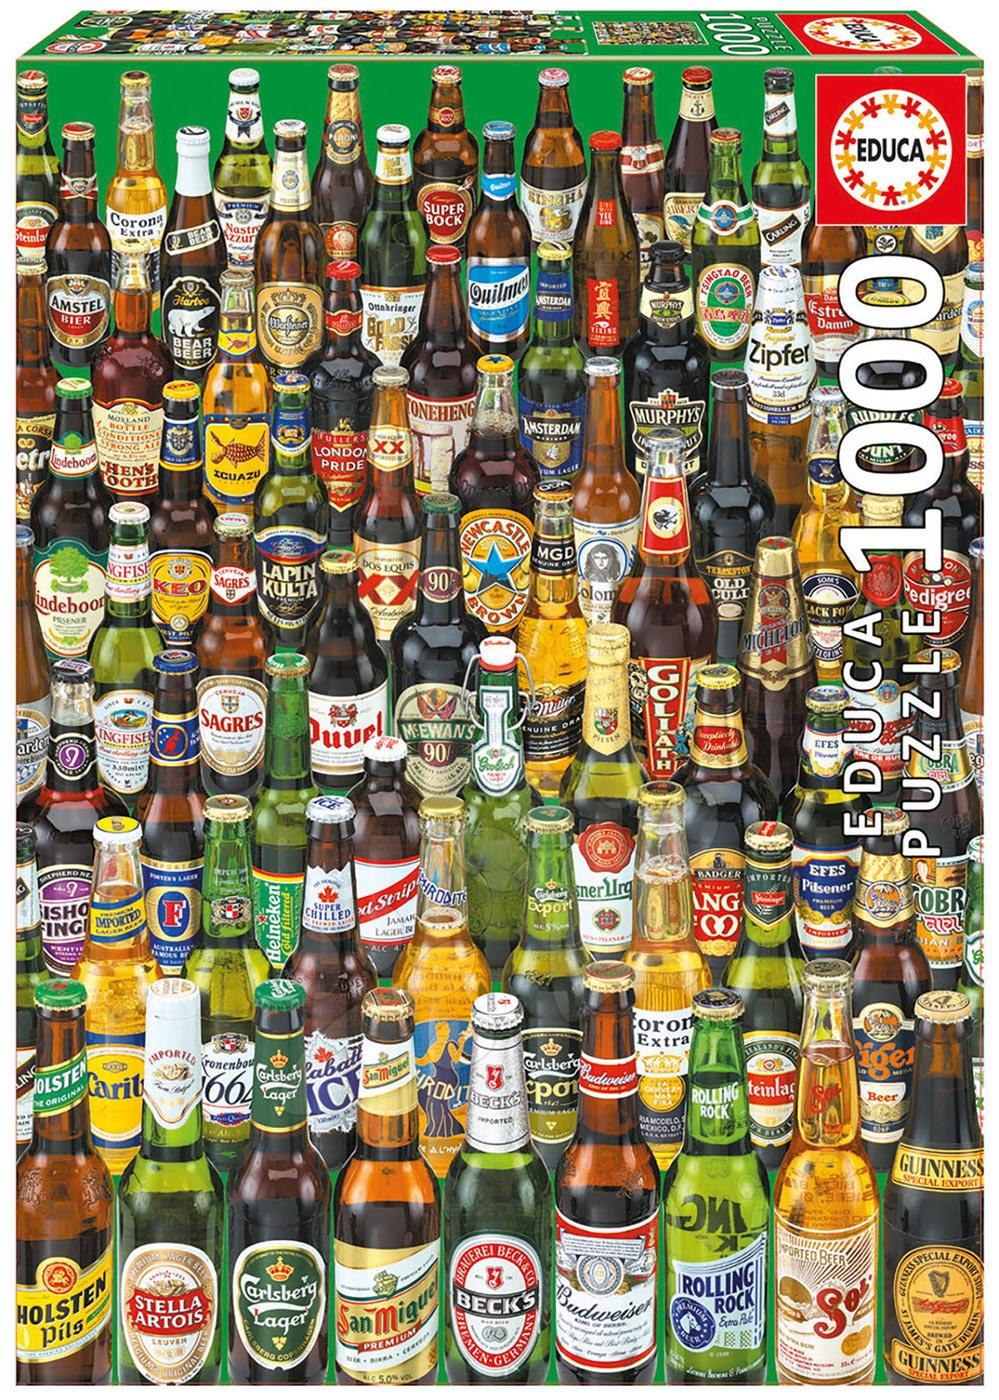 Puzzle Beers Educa 1000 db 12 évtől